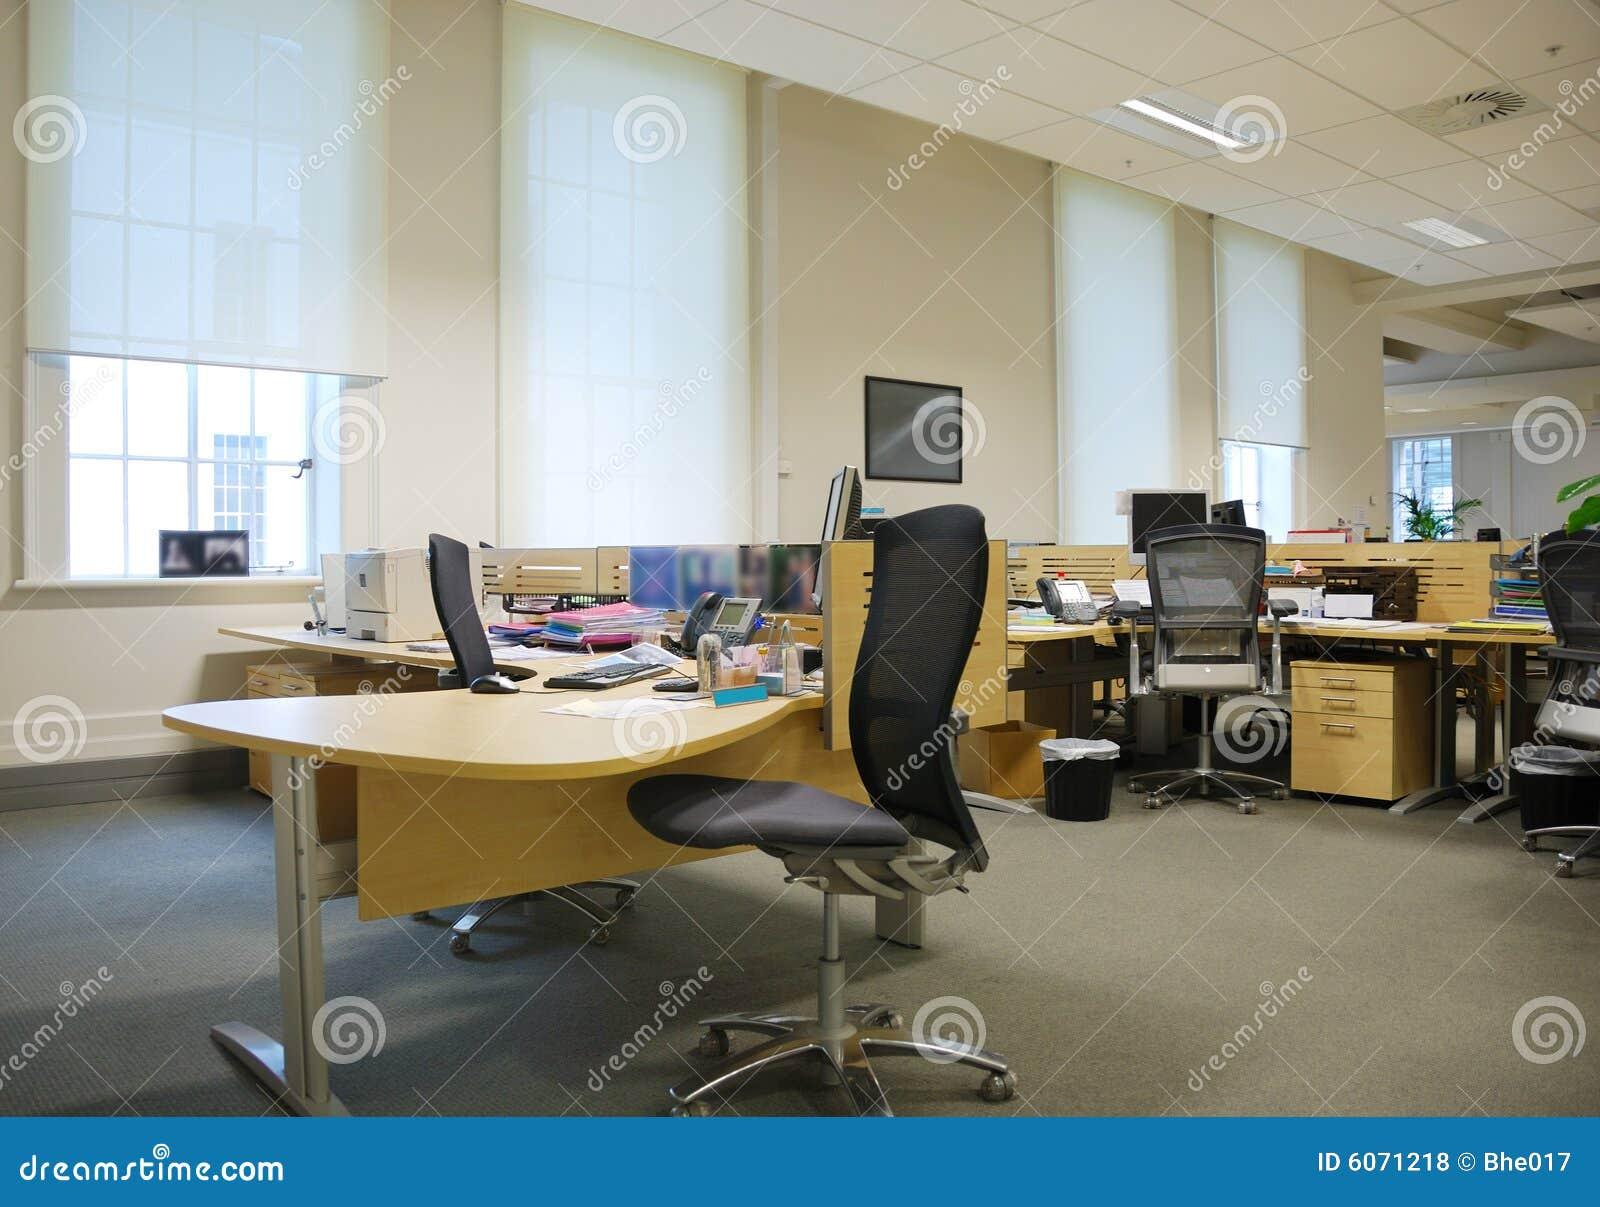 Lieu De Travail De Bureau Photos libres de droits Image 6071218